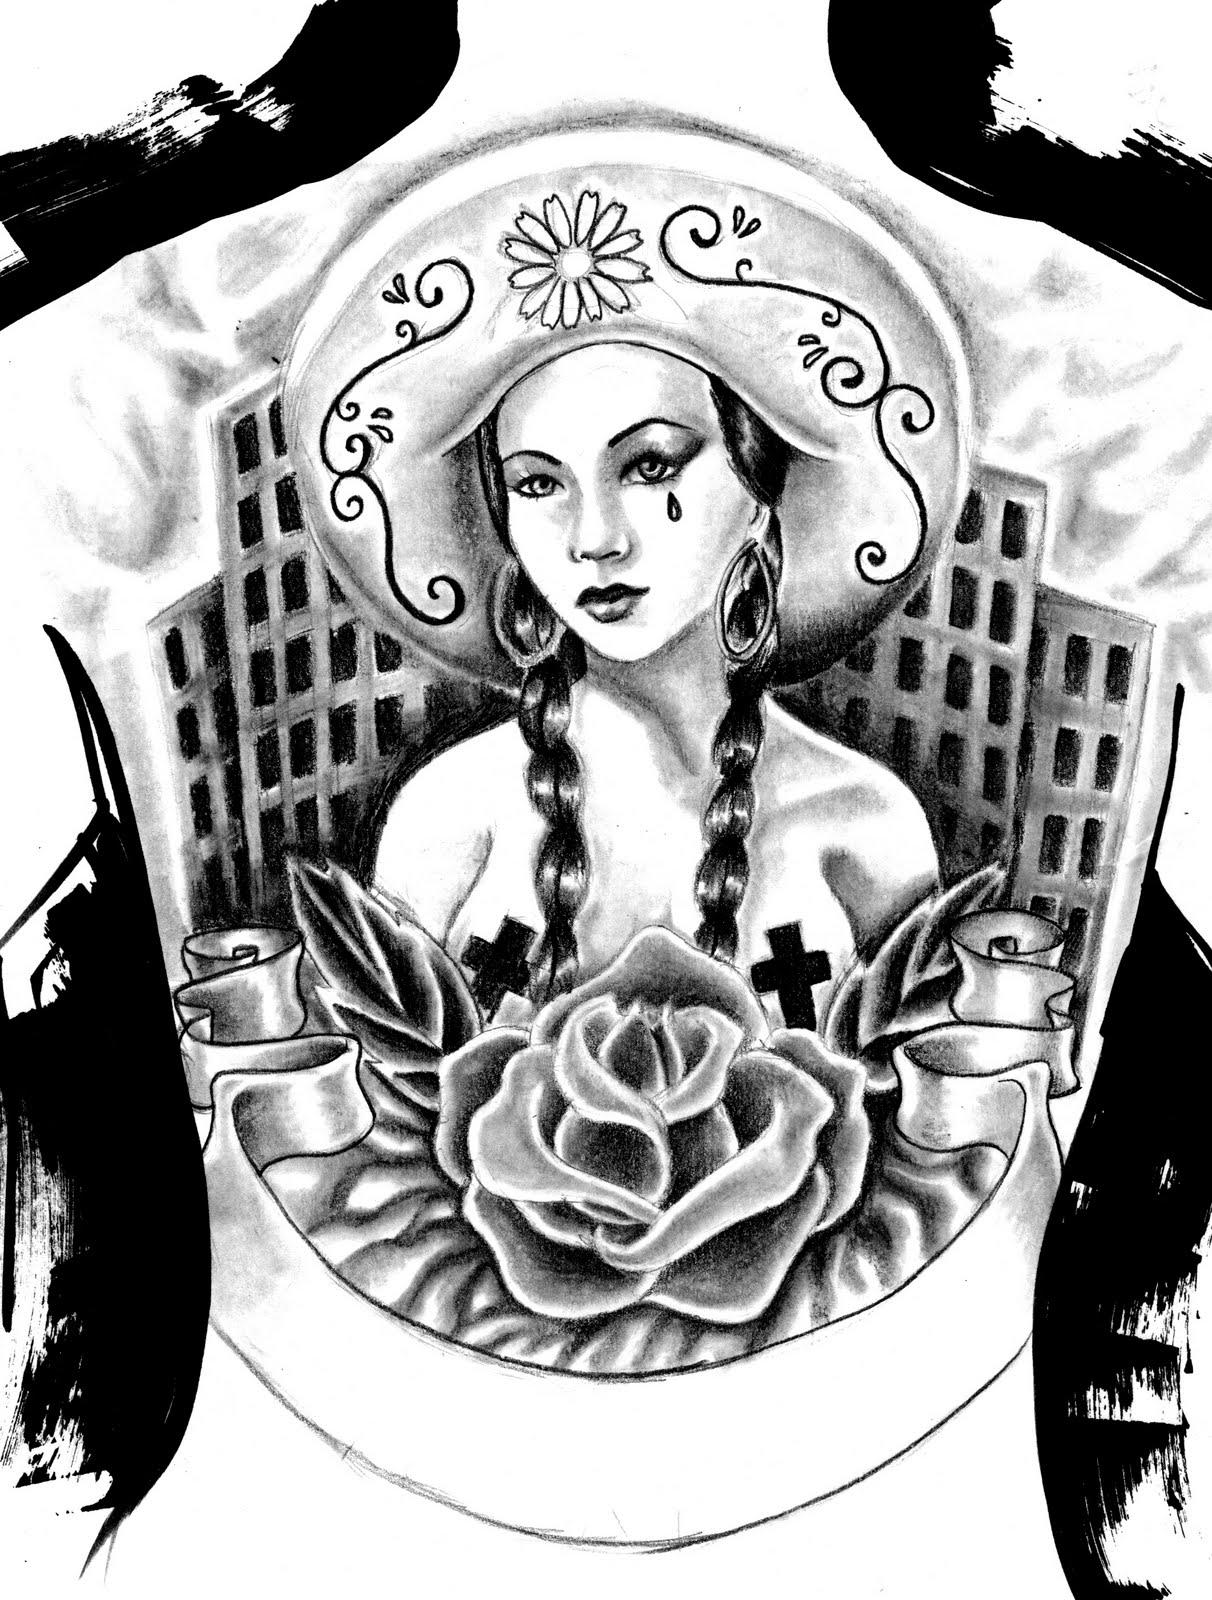 Microcosm: Mexican gangster back piece - Tattoo DesignGangsta Artwork